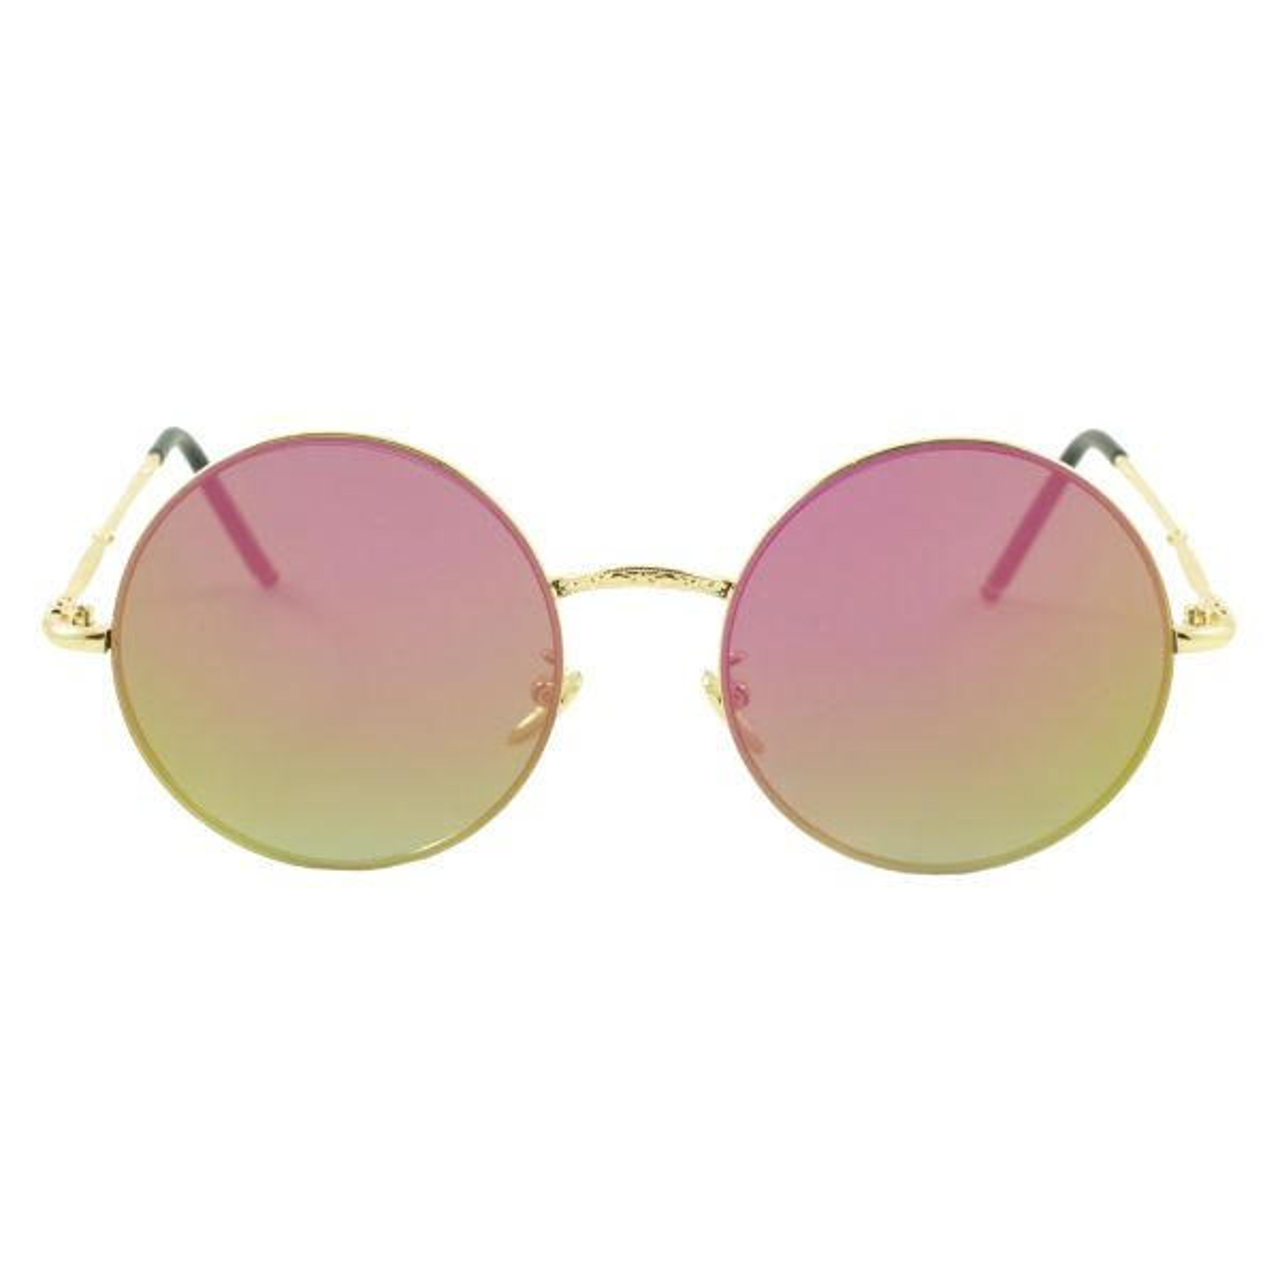 عینک آفتابی ویلی بولو مدل Pure Rose Gold Round